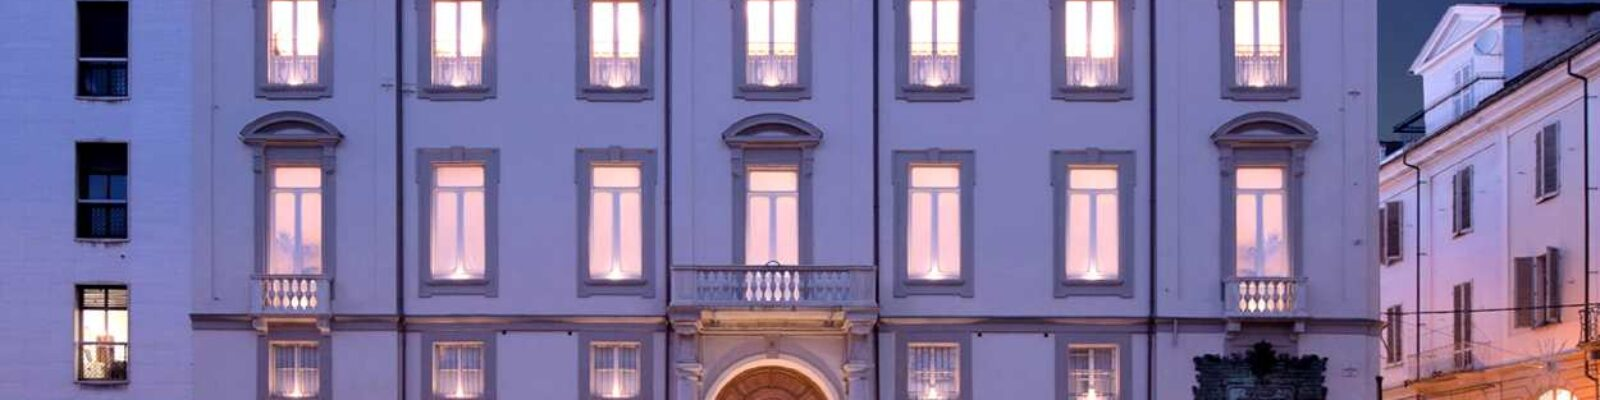 Alessandria Vetus Palace prospetto frontale illuminato